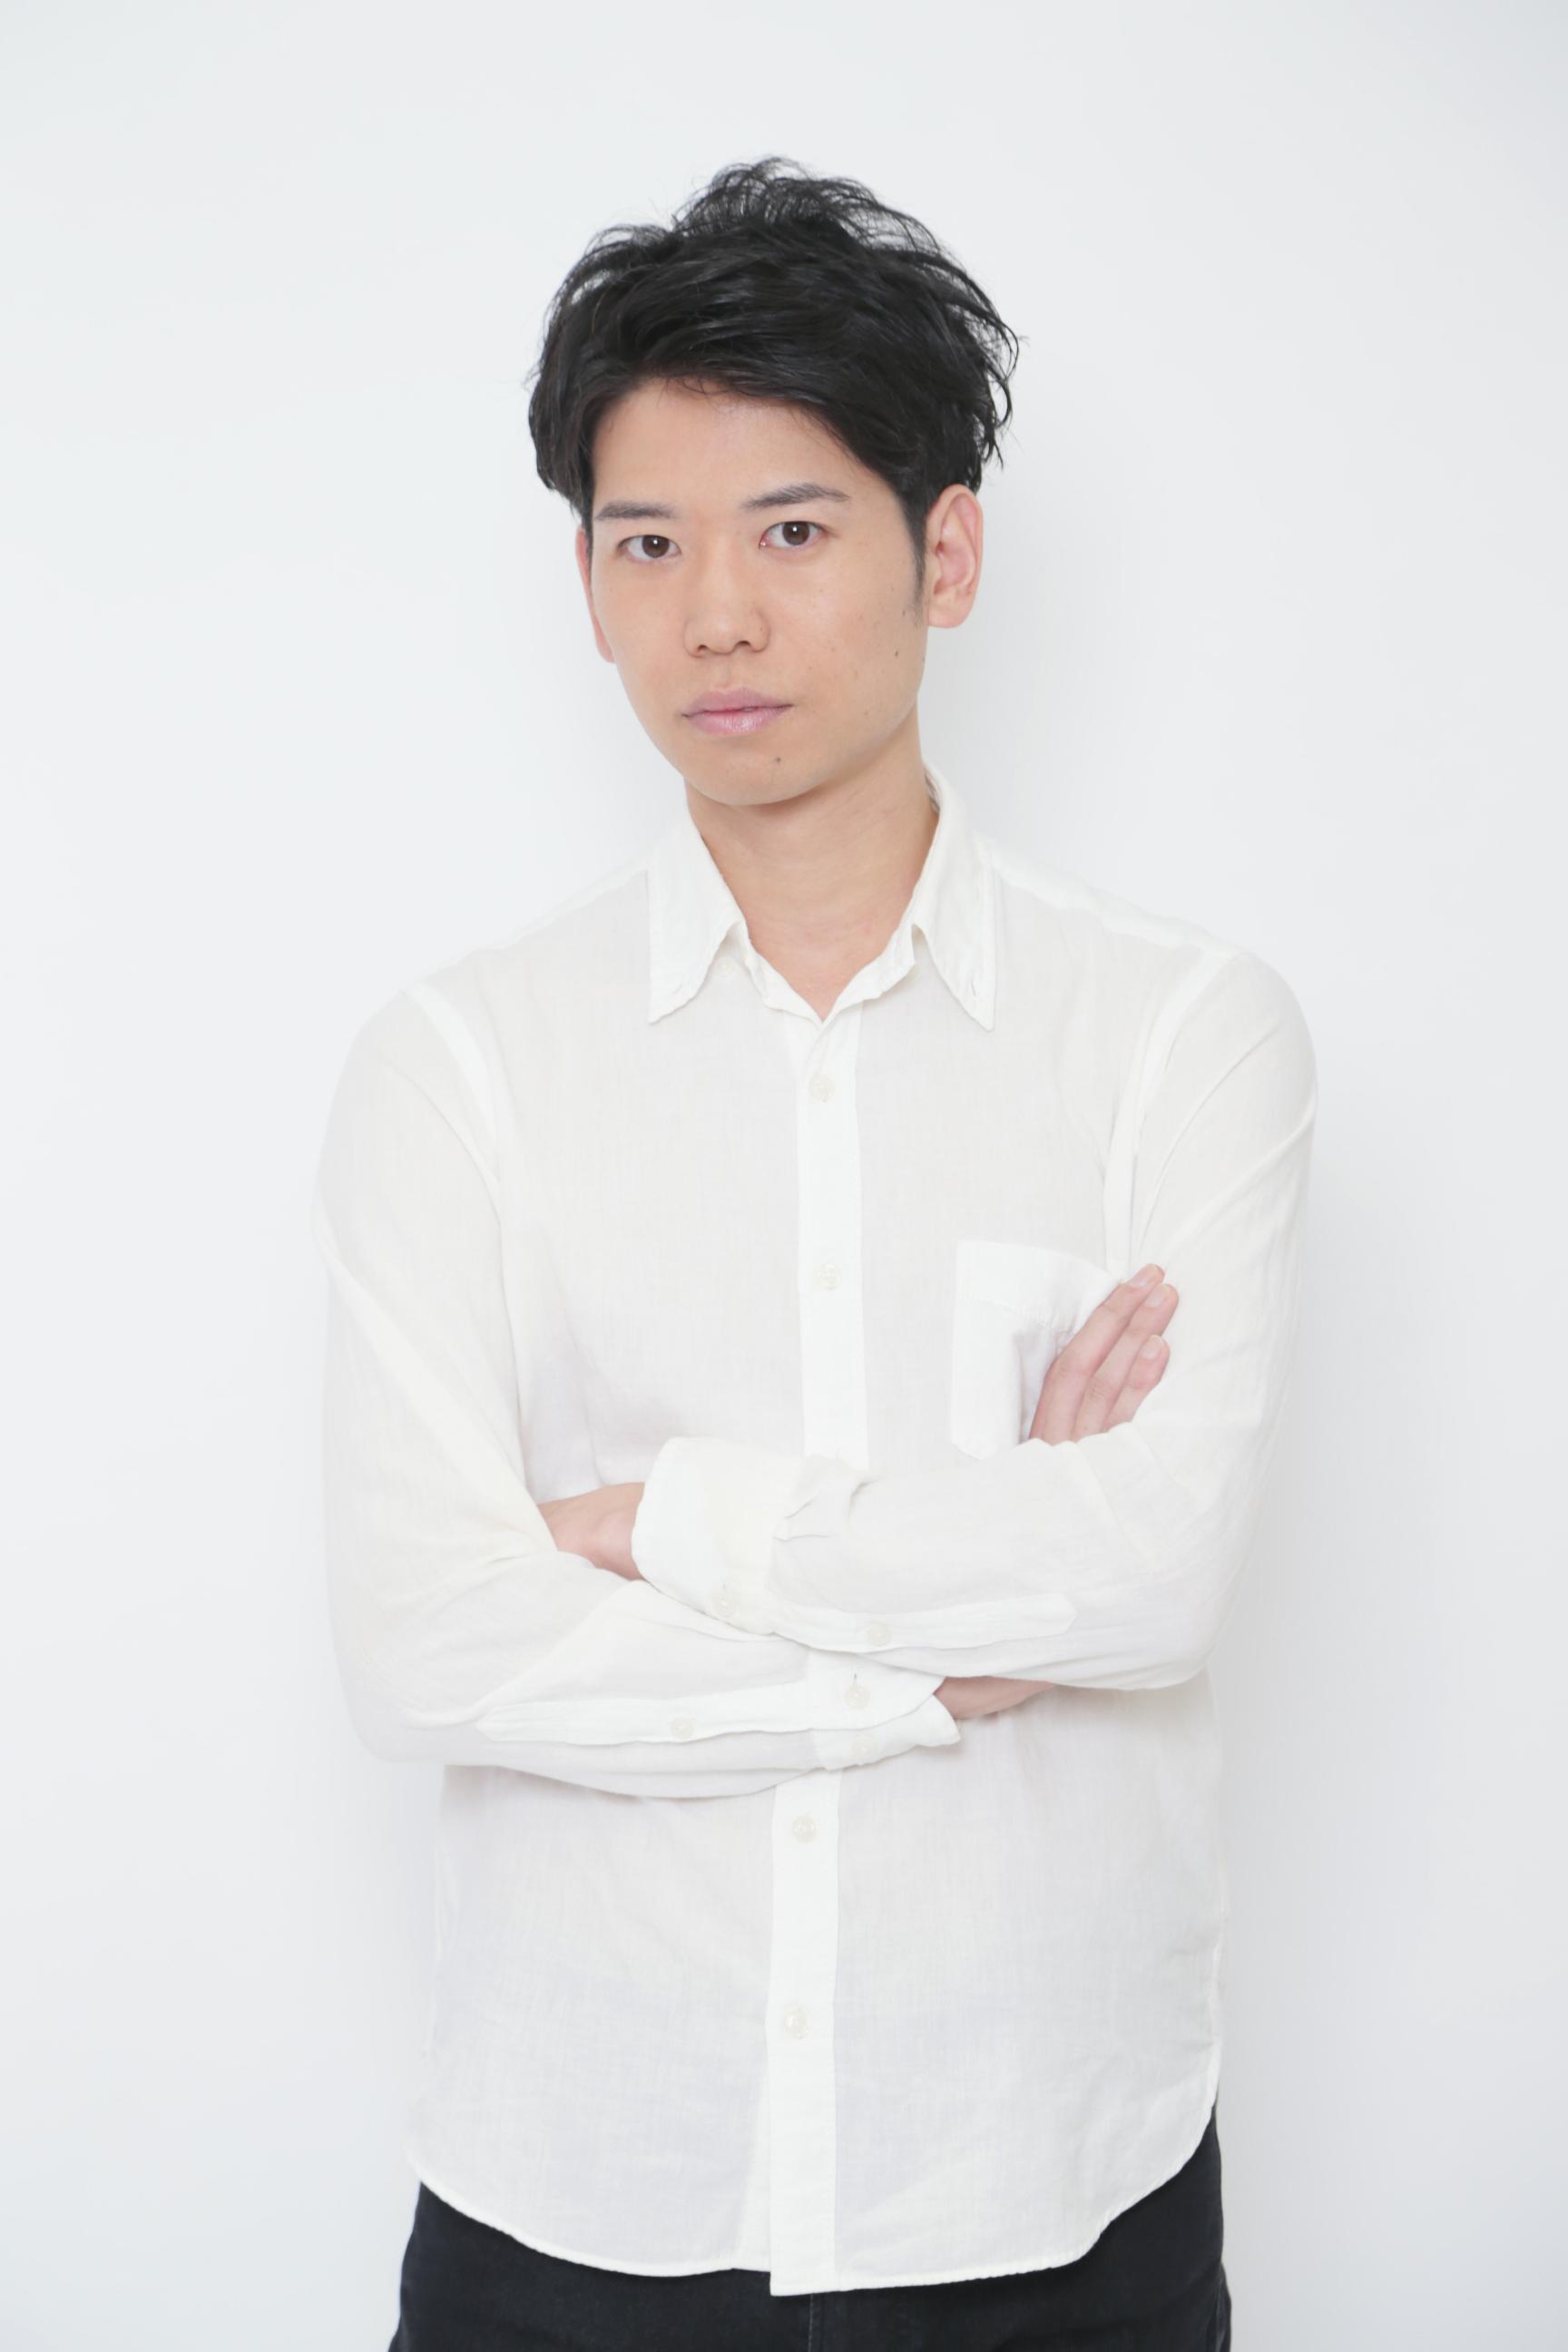 竹田光呂   Takeda Hiro